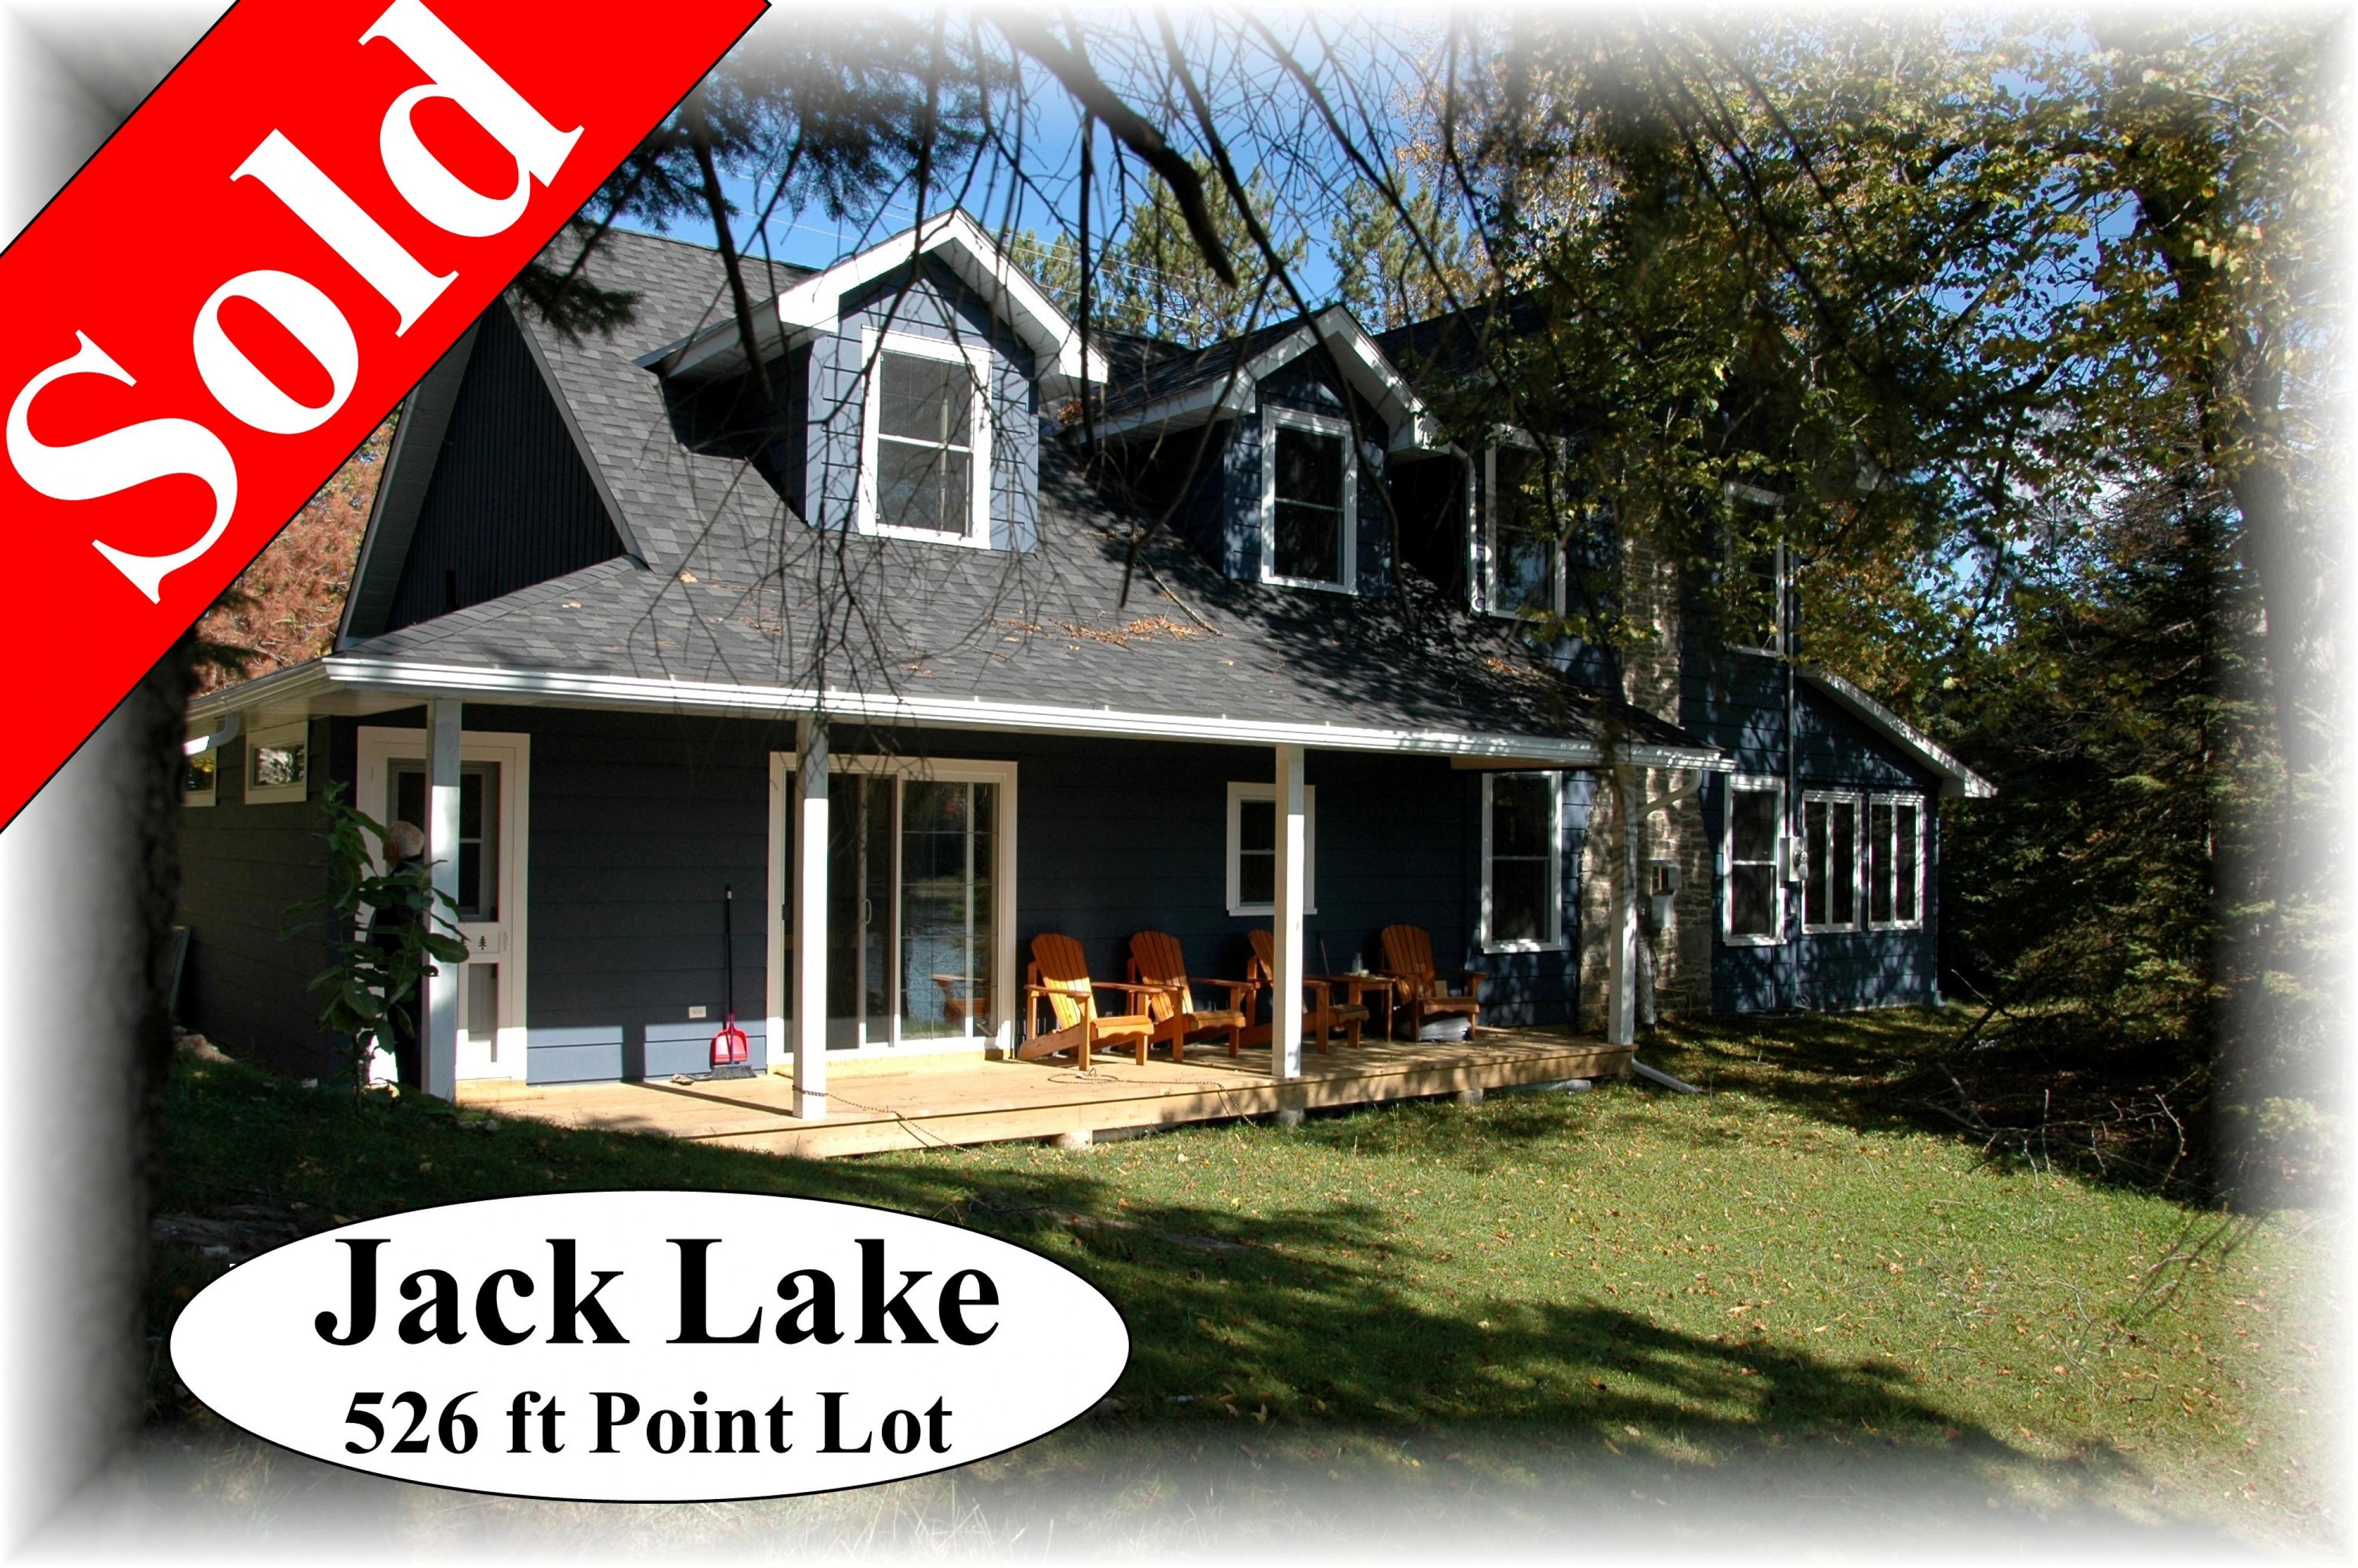 Jack Lake , Apsley, Ontario, Canada